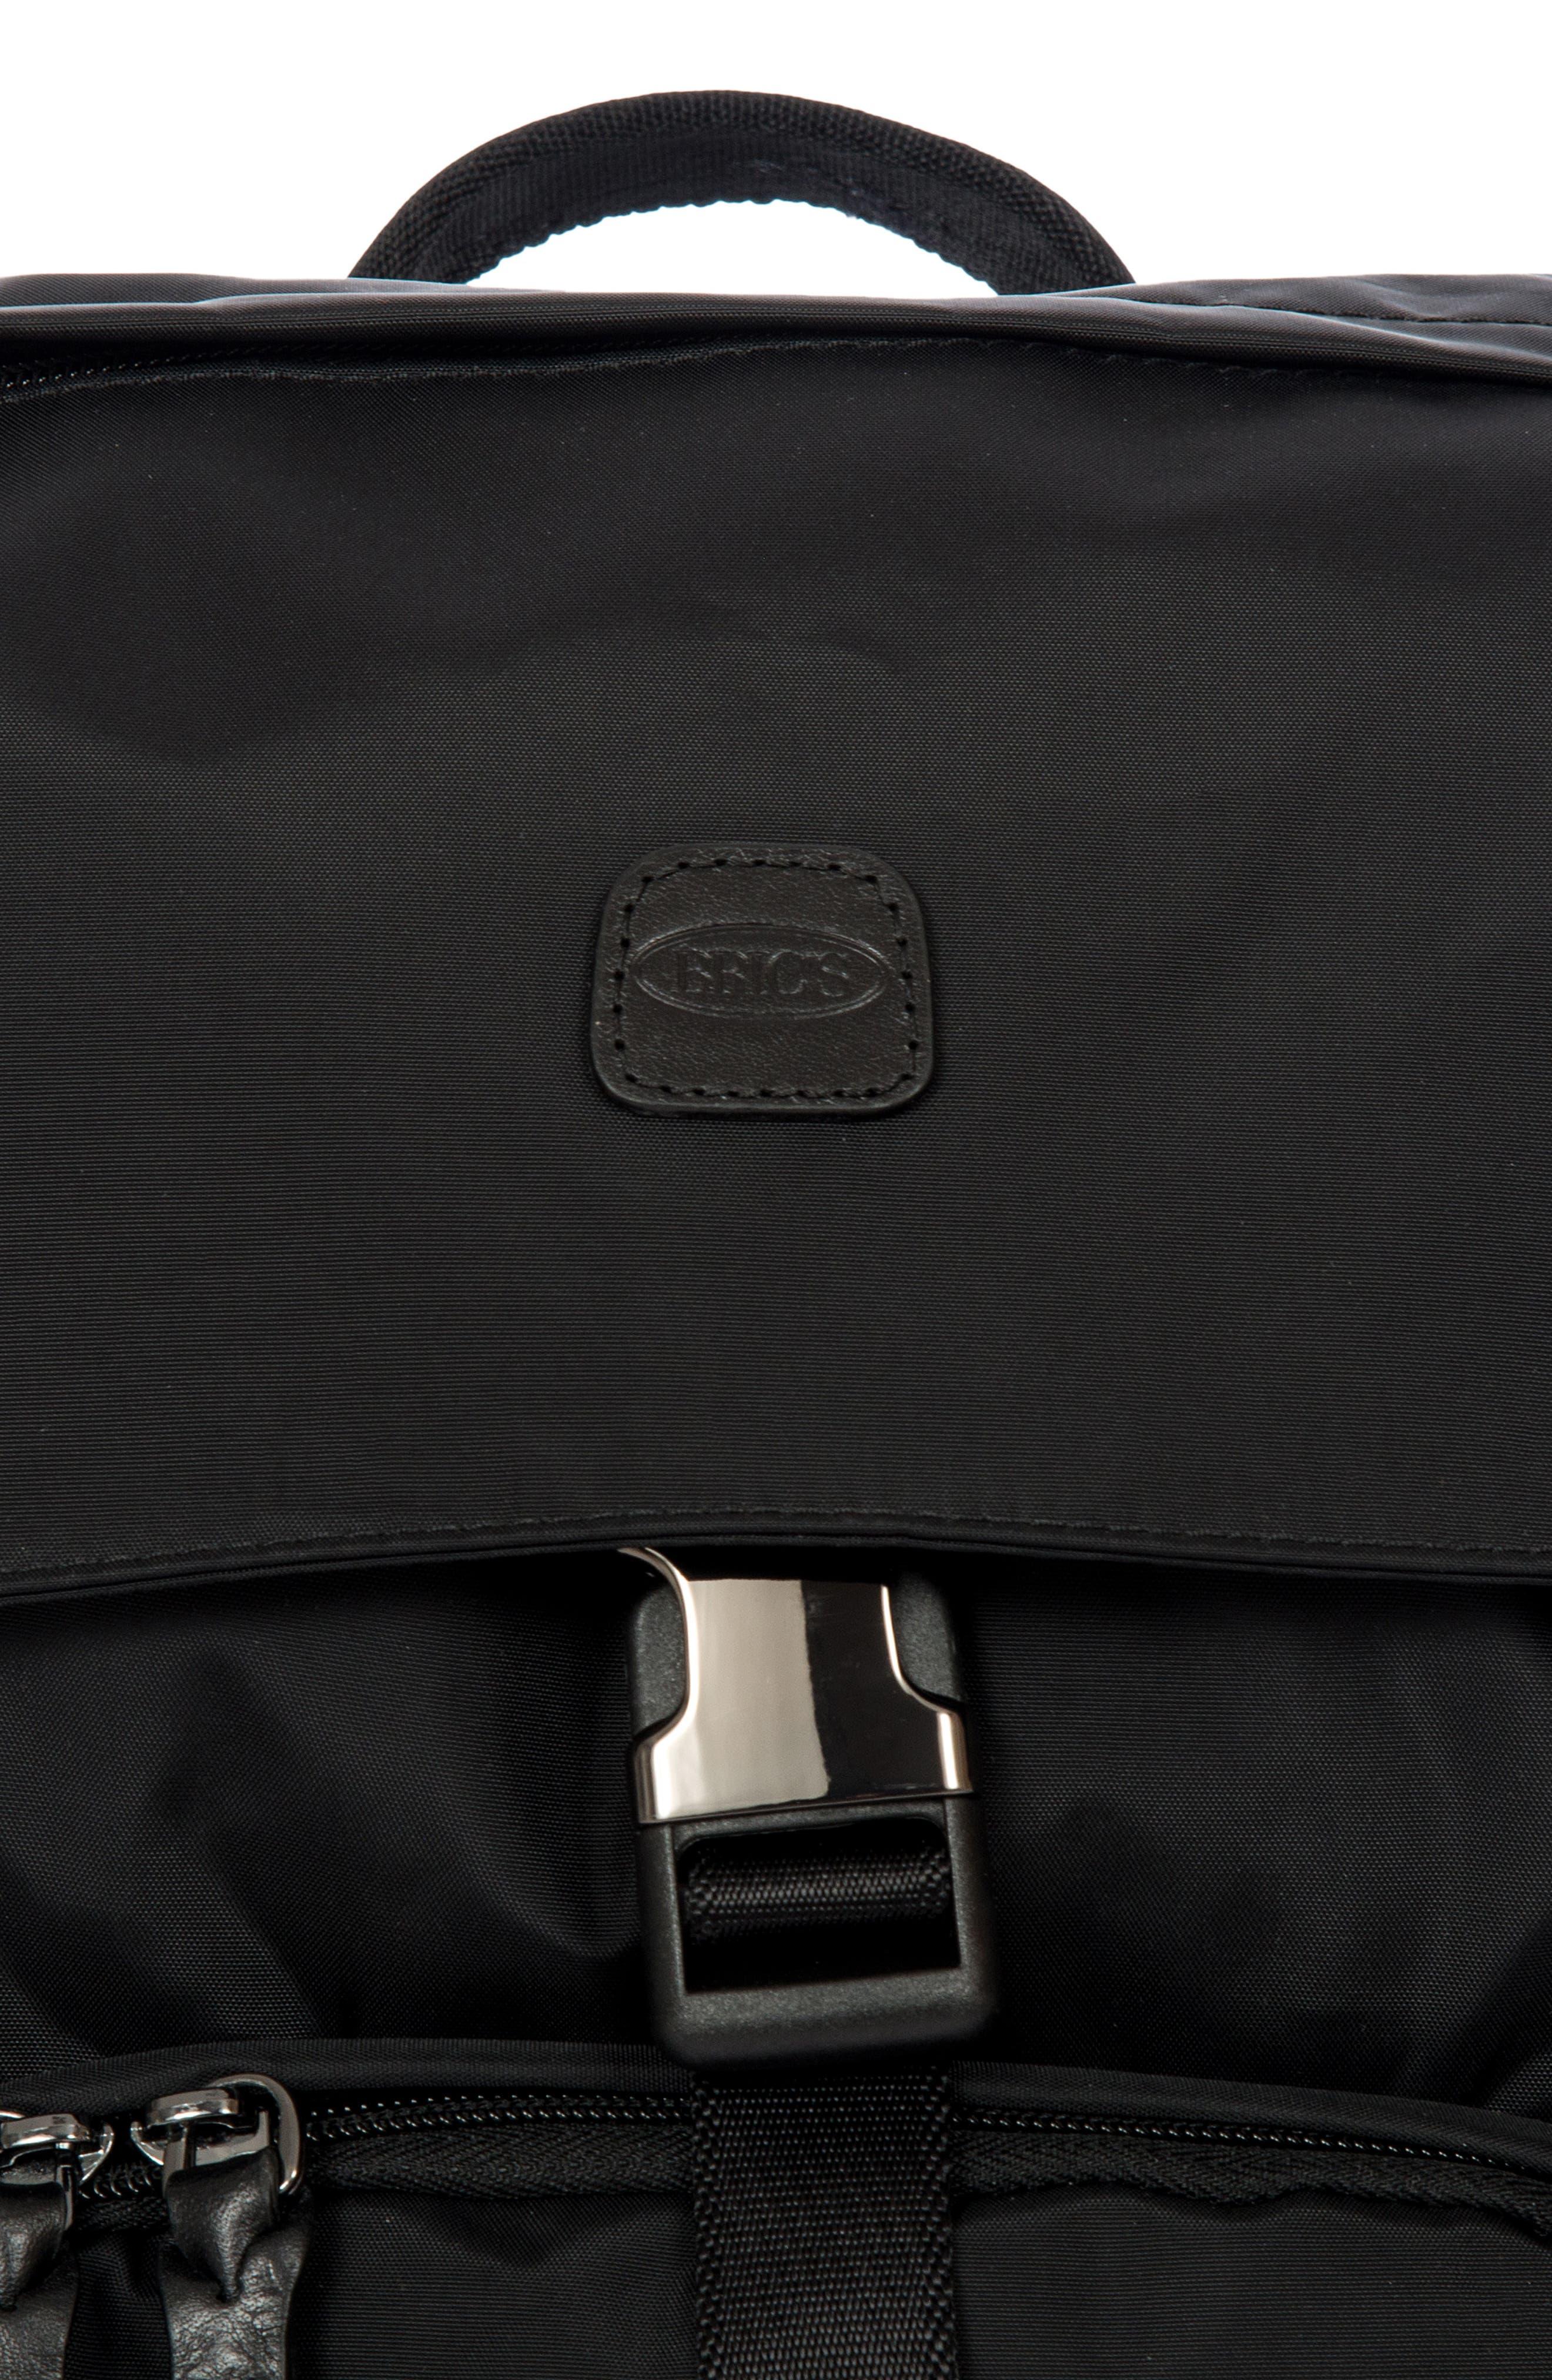 X-Bag Travel Excursion Backpack,                             Alternate thumbnail 5, color,                             BLACK/ BLACK